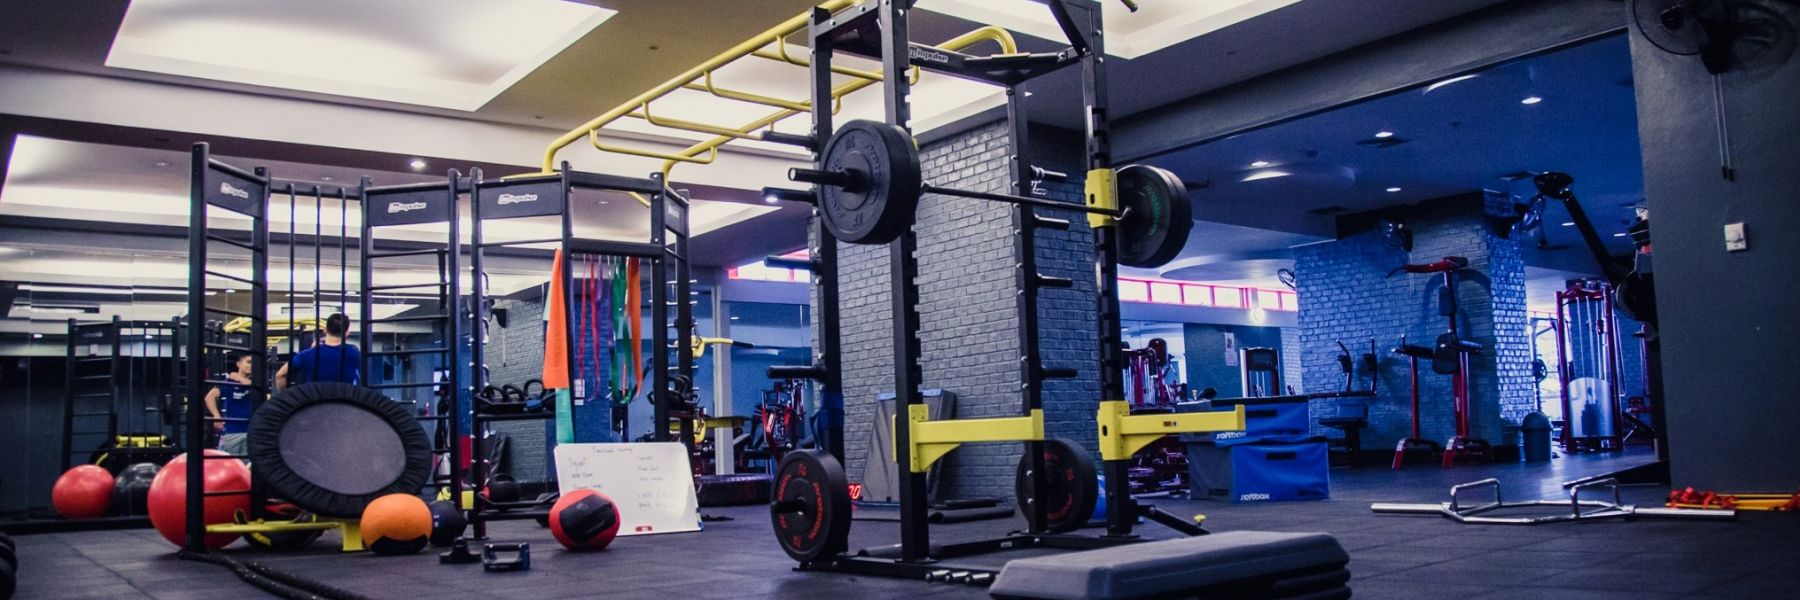 Elite Training Center image